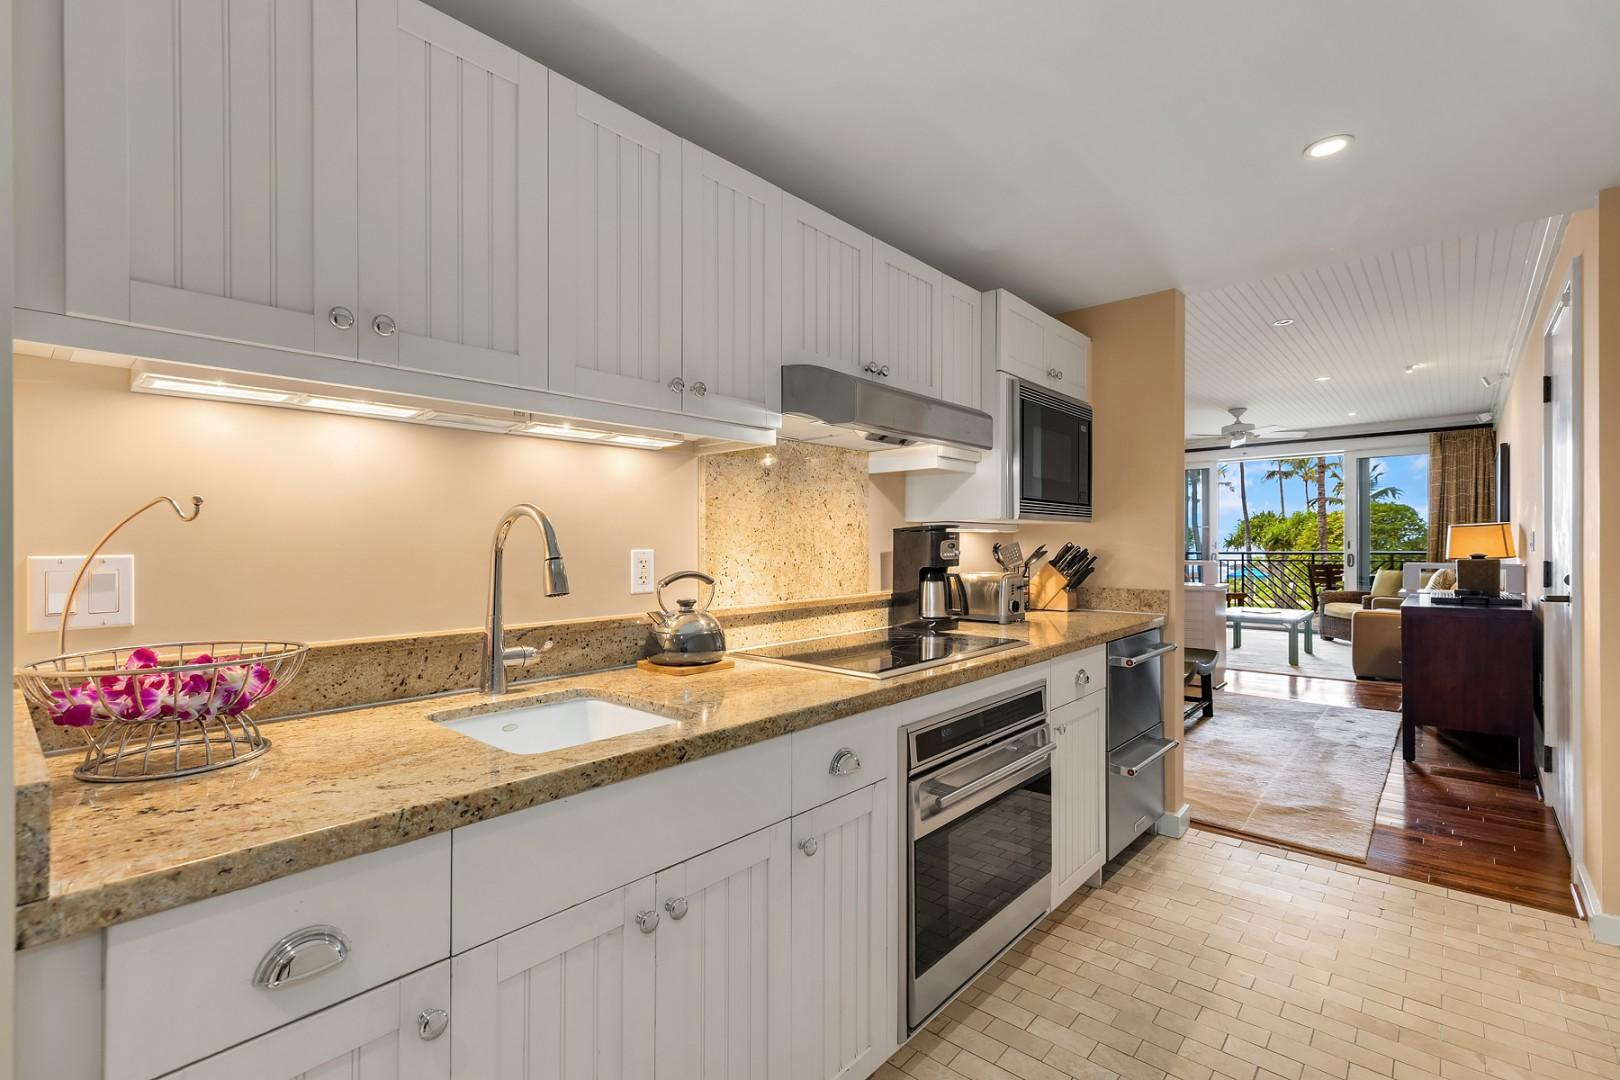 Villa 205: Kitchen